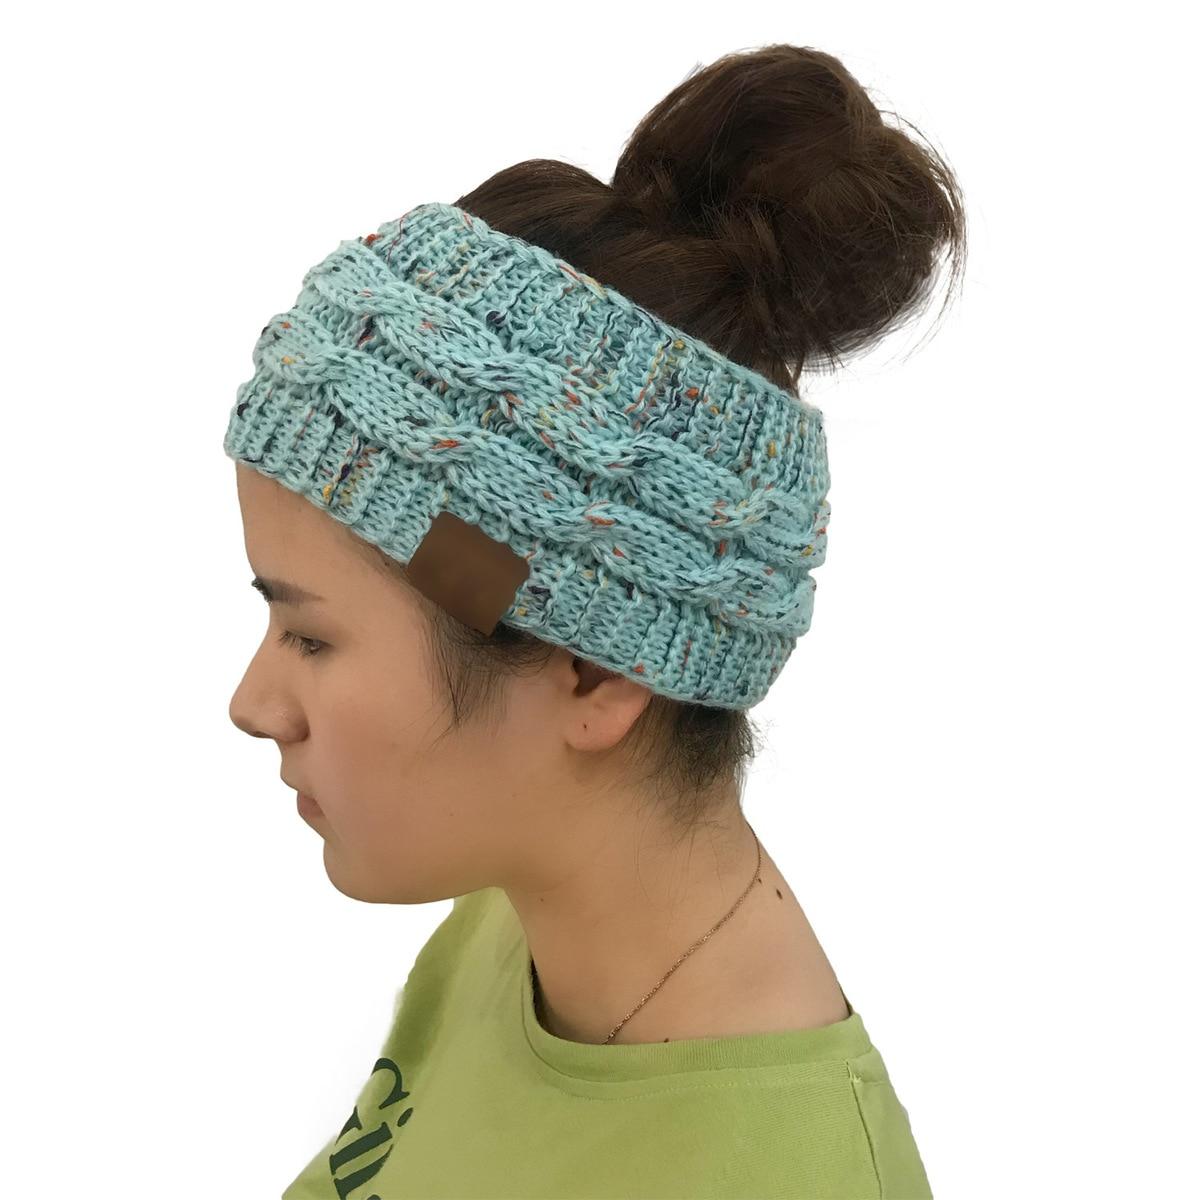 ... Cap Women s Classic CC Beanies Ear Warmers Head Wrap Thick Knit Headwrap  CC Hat ... ce6b22fc7da7